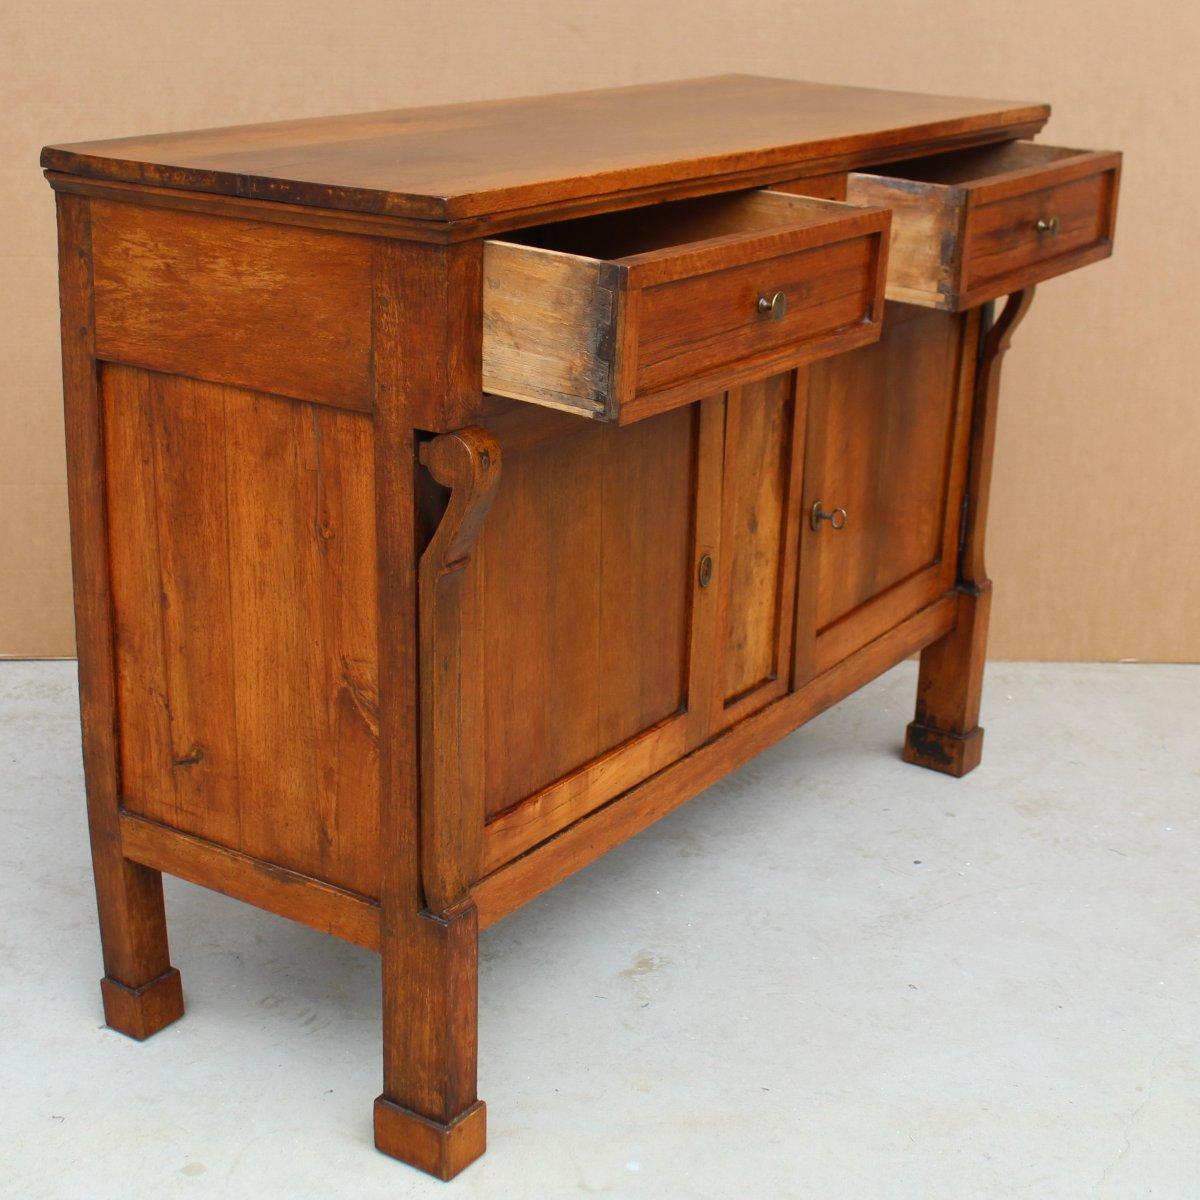 Antique Empire Sideboard Dresser Cabinet Cupboard Buffet In Walnut - Italy 19th-photo-1